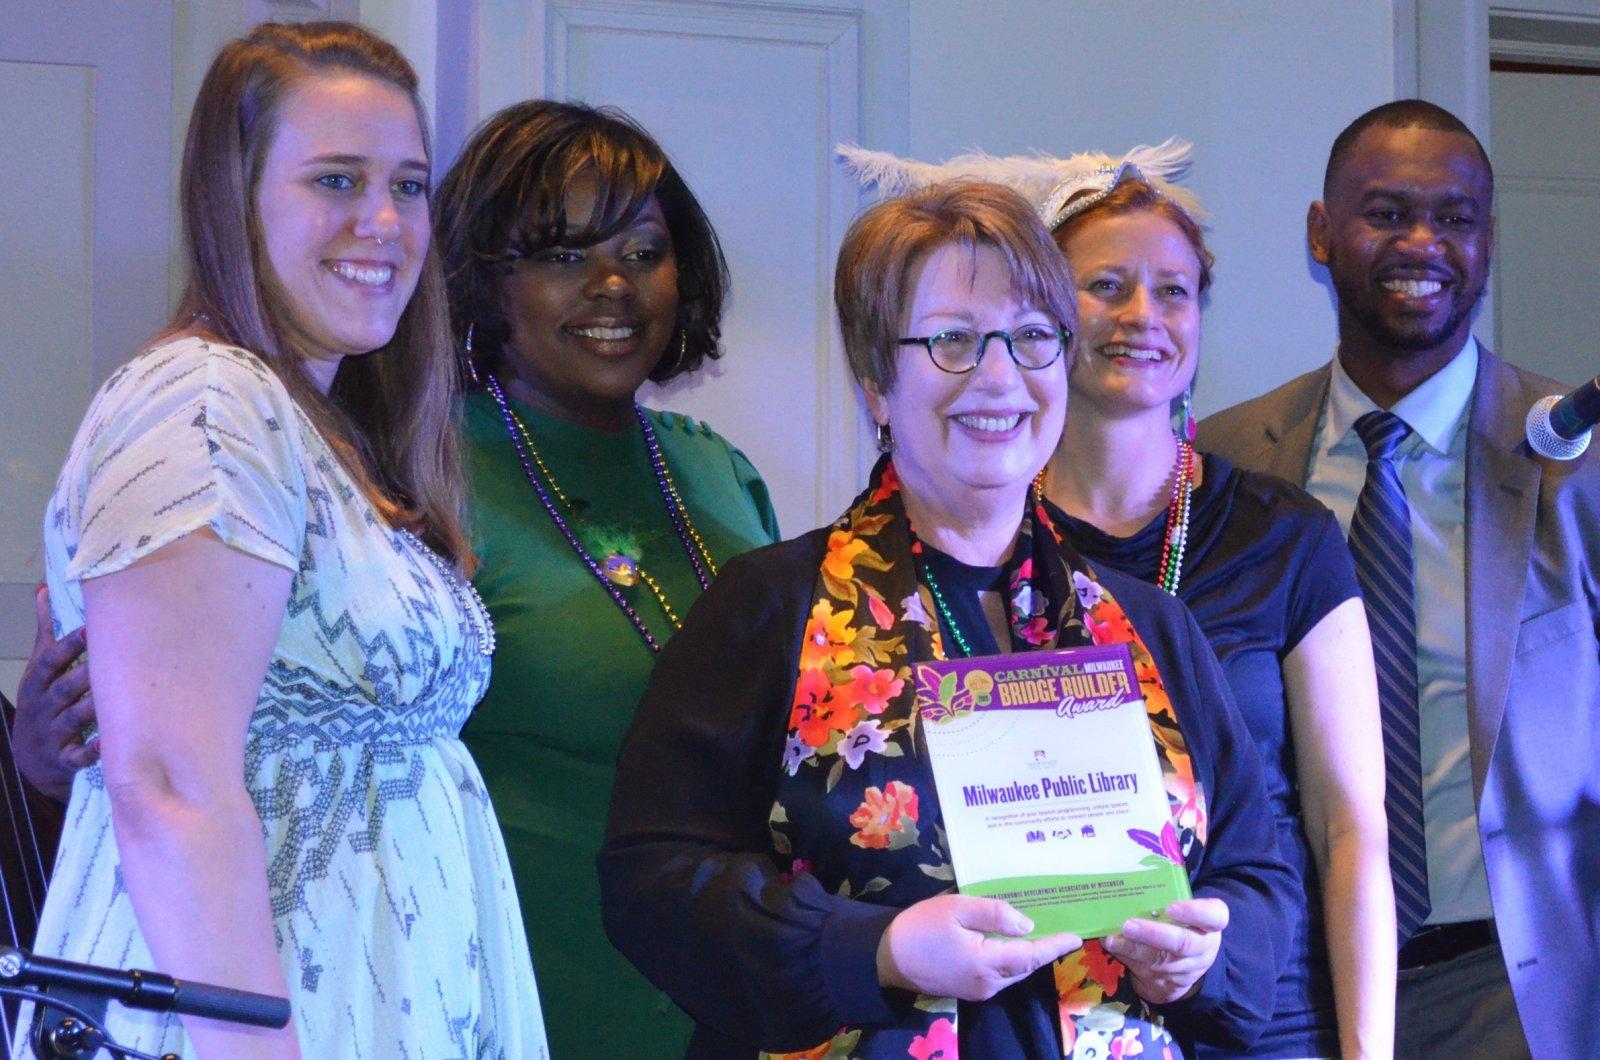 City Librarian Paula Kiely accepts UEDA\'s Bridge Builder Award at Carnival Milwaukee